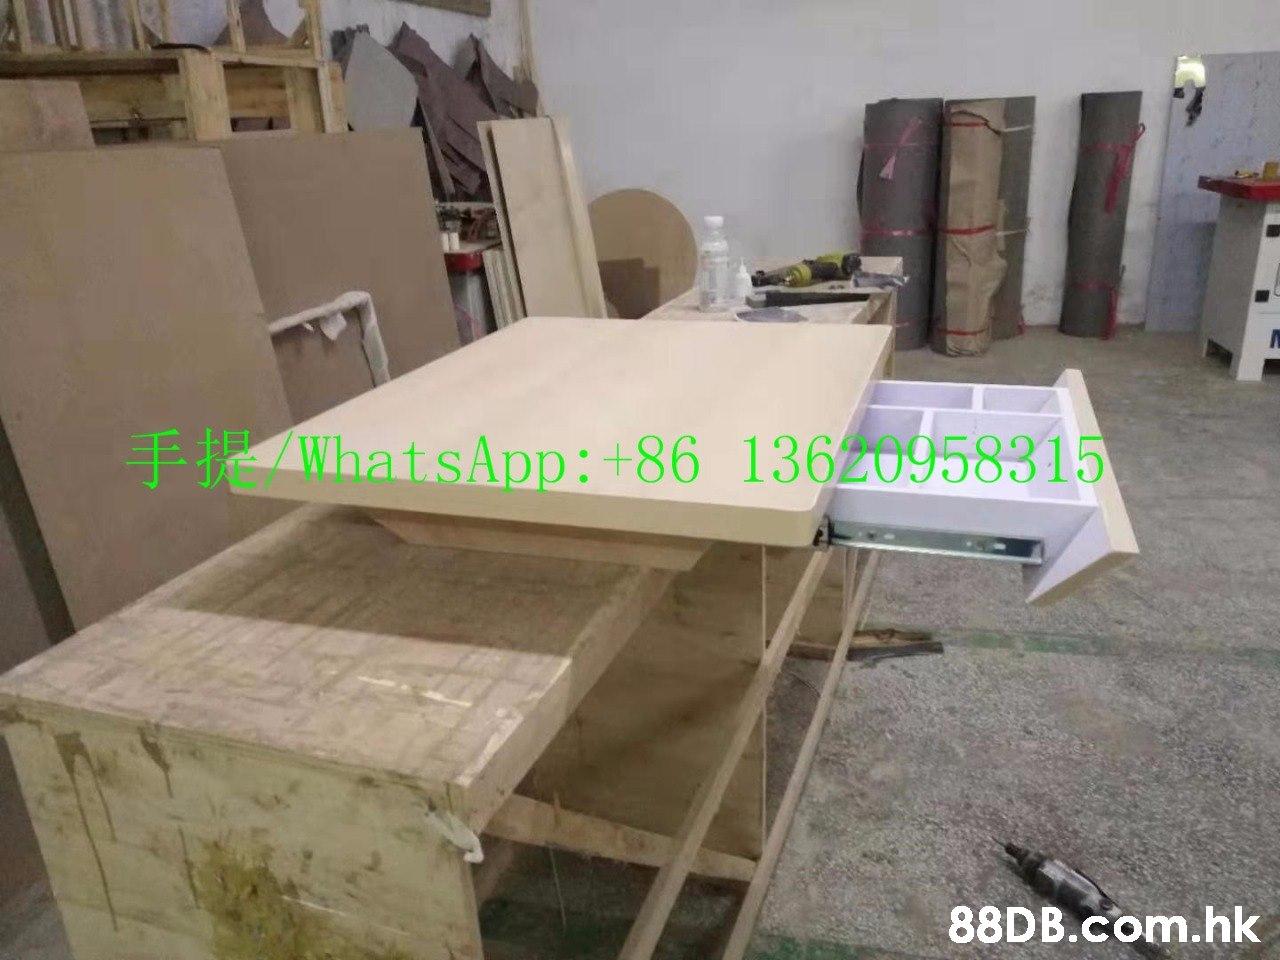 FWhatsApp : +86 13620958315 .hk  Table,Furniture,Wood,Plywood,Folding chair